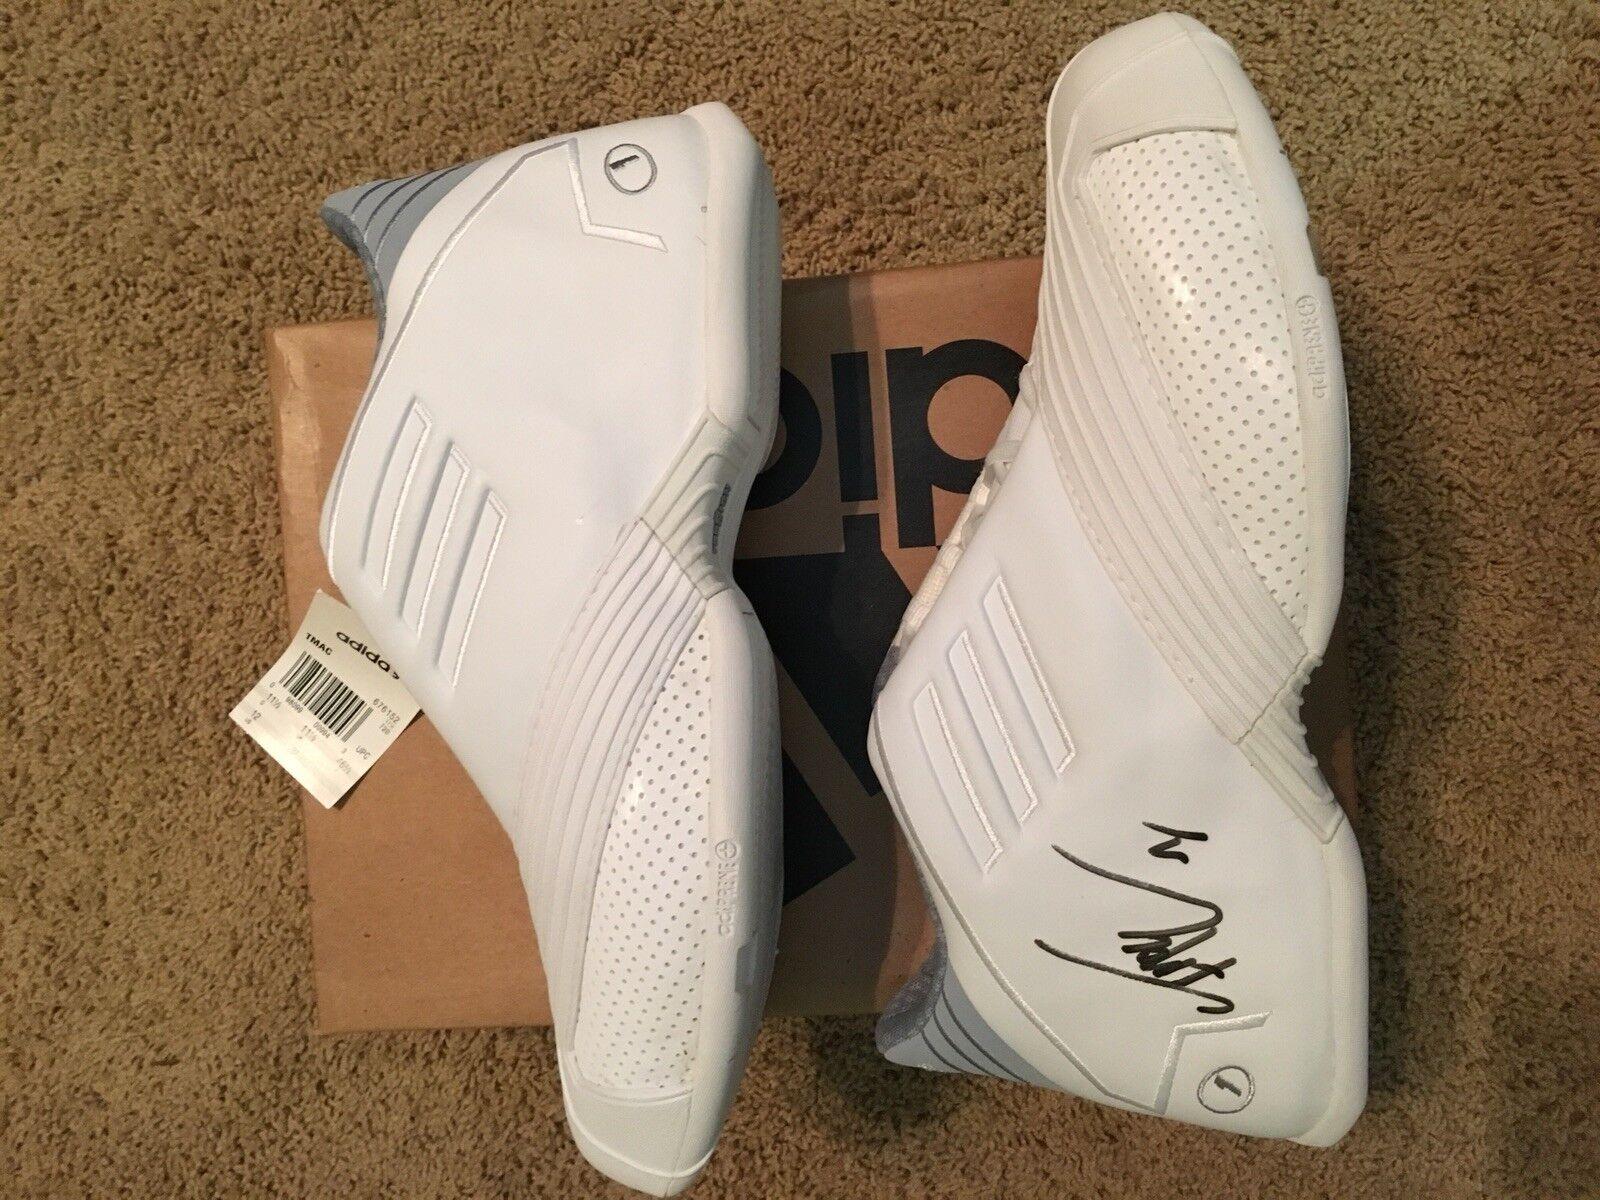 Tracy McGrady Signed Adidas TMac I 1 shoes White 676152 12 DS New Orlando Magic